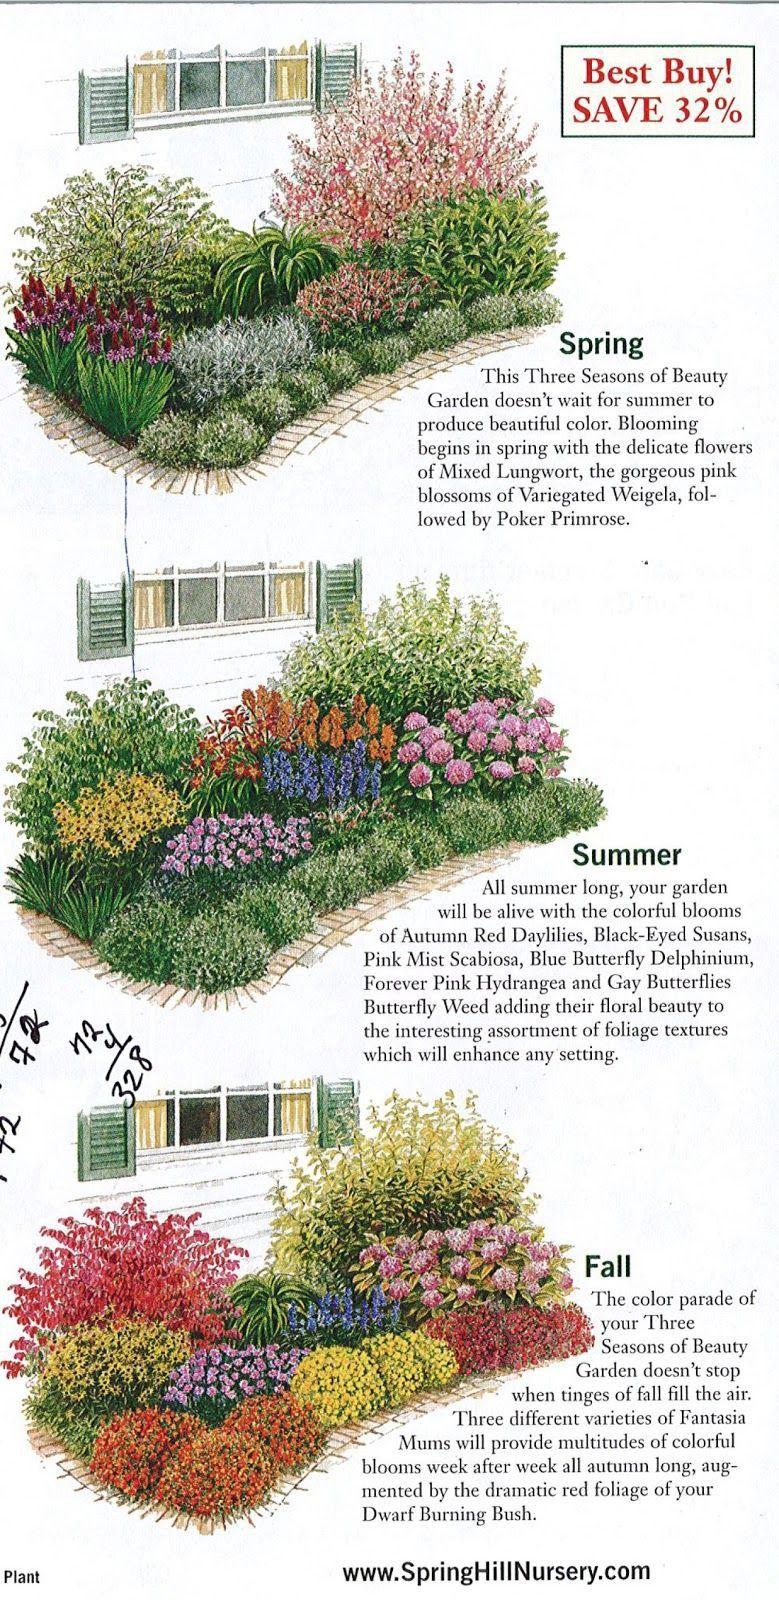 Best Of Flower Bed Designs Layout Perennial Gardens Gardening Garden Plan A Week Wee Flower Garden Plans Flower Garden Layouts Garden Design Layout Landscaping